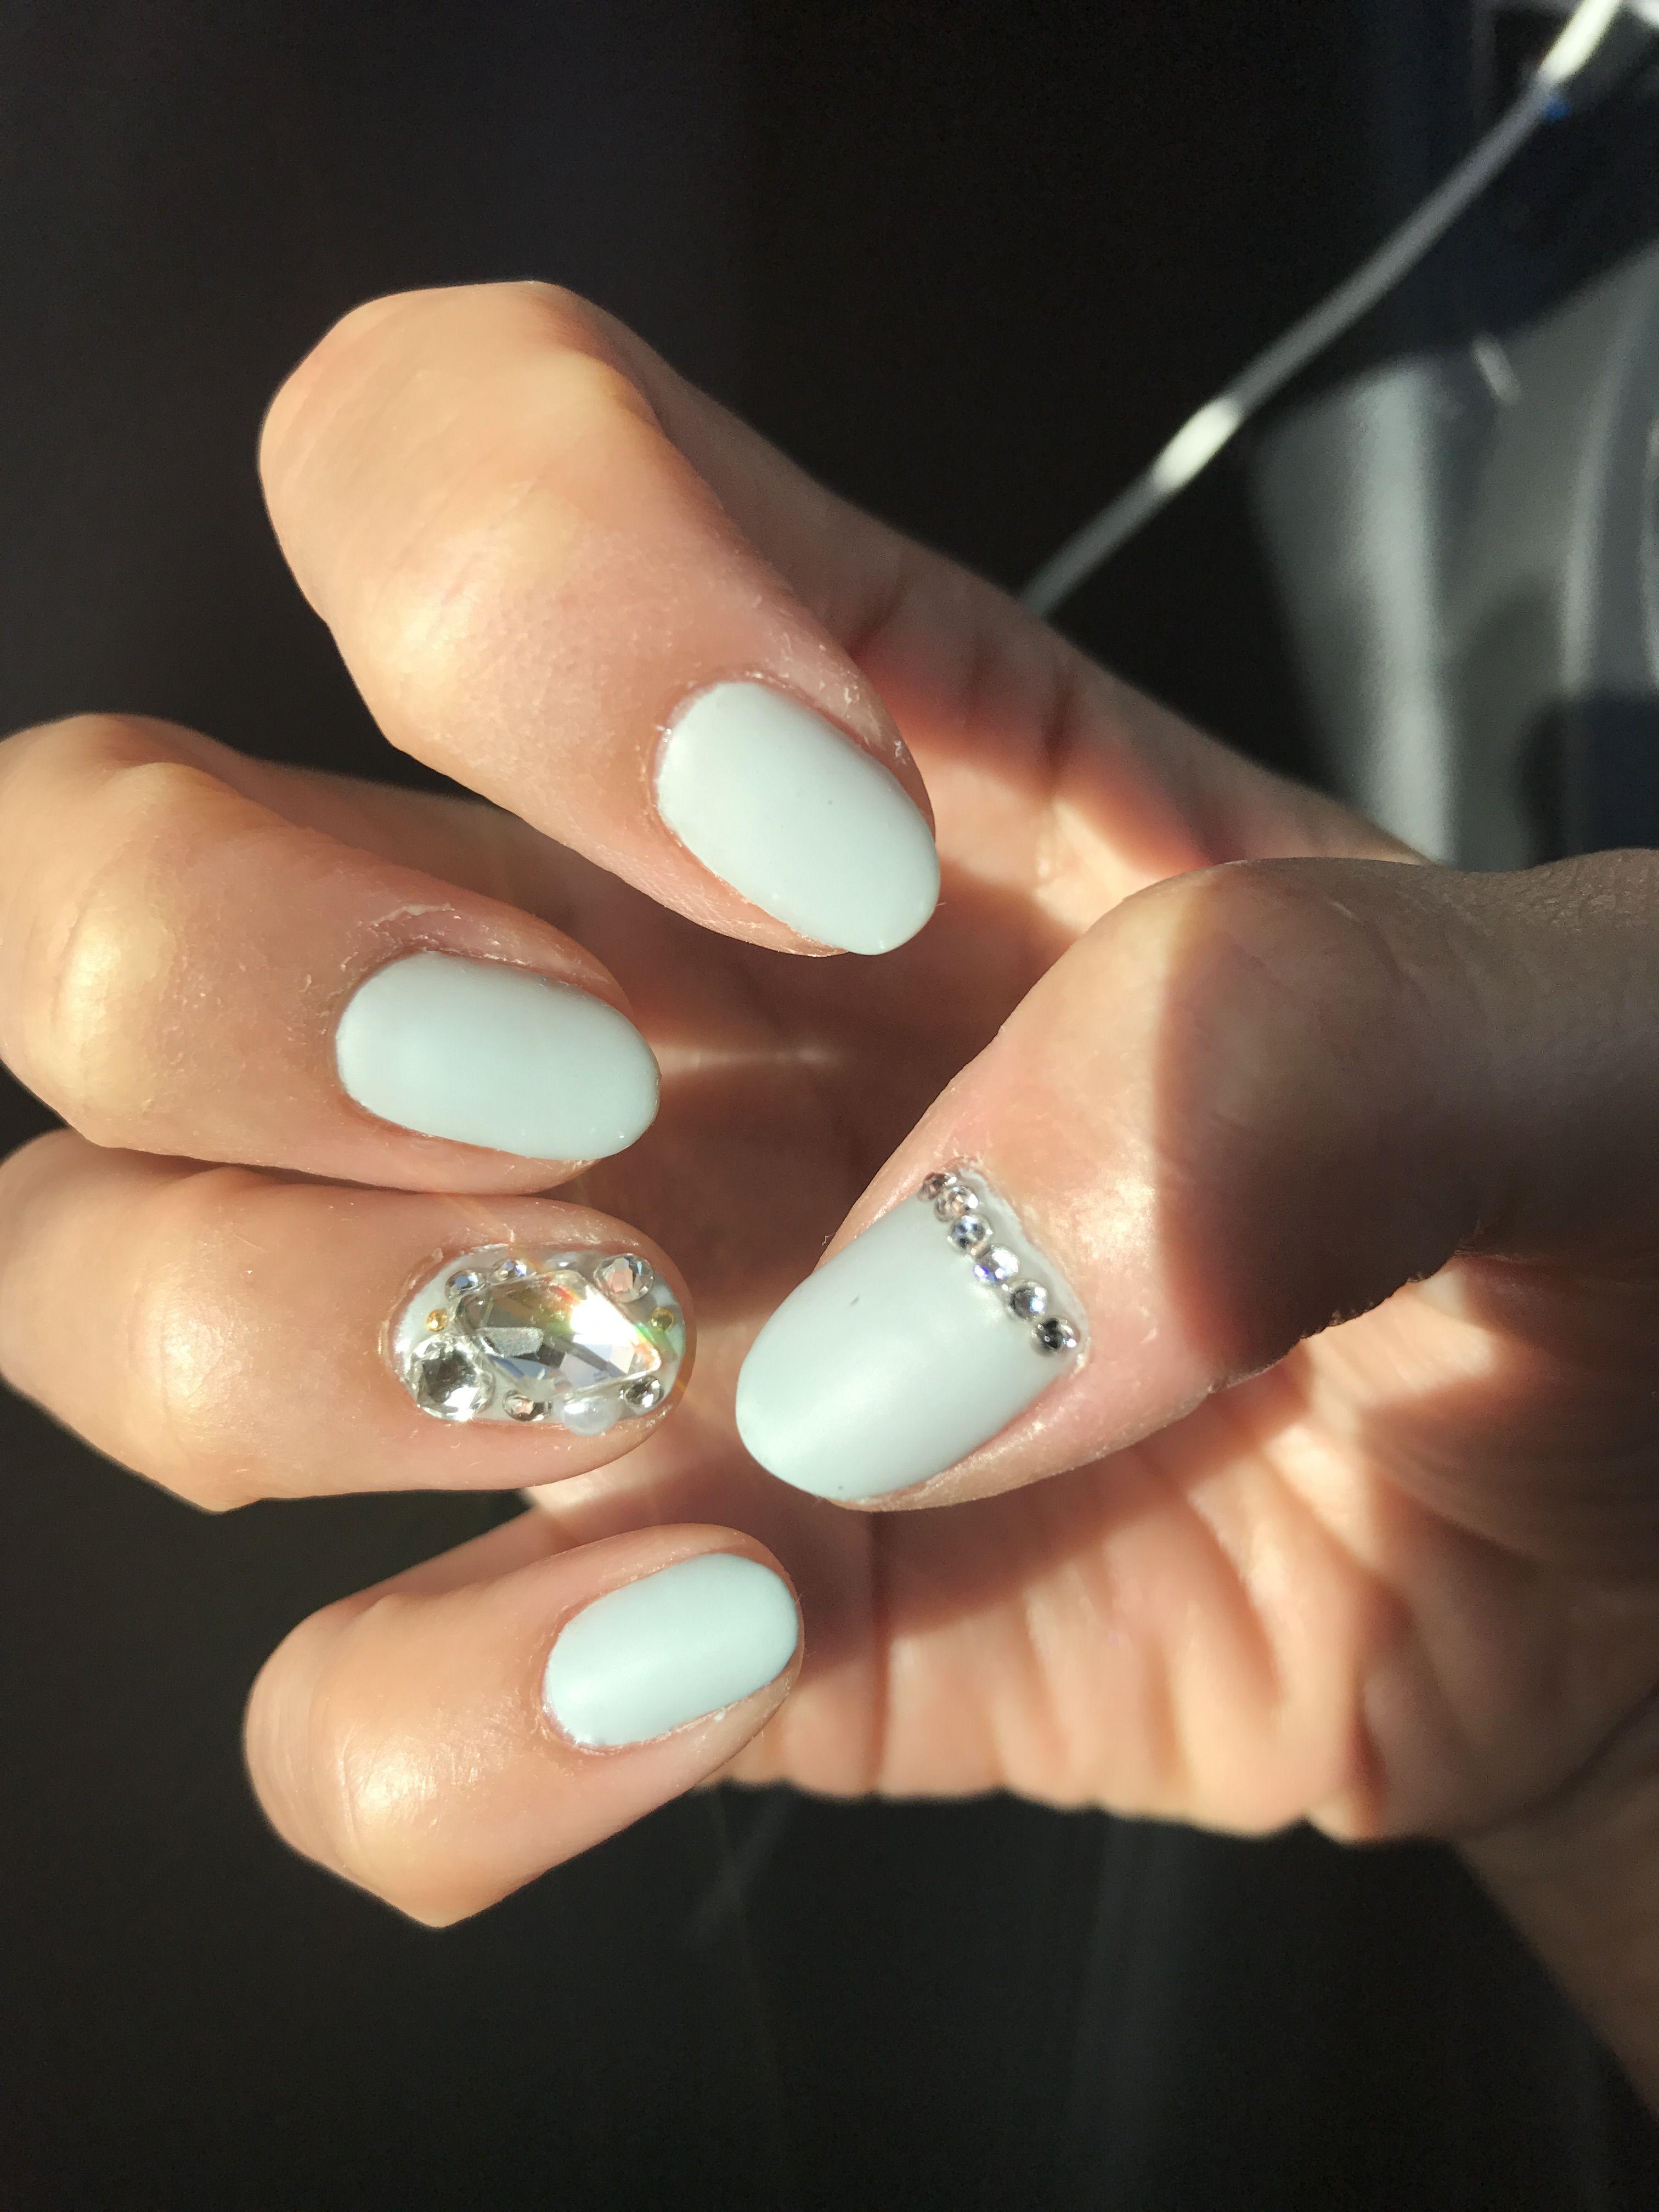 Matte Sage Korean Hard Gel Nail Design With Swarovski Rhinestone Crystals Pearls And Small Gold Metal Embellishments Hard Gel Nails Gel Nails Nails